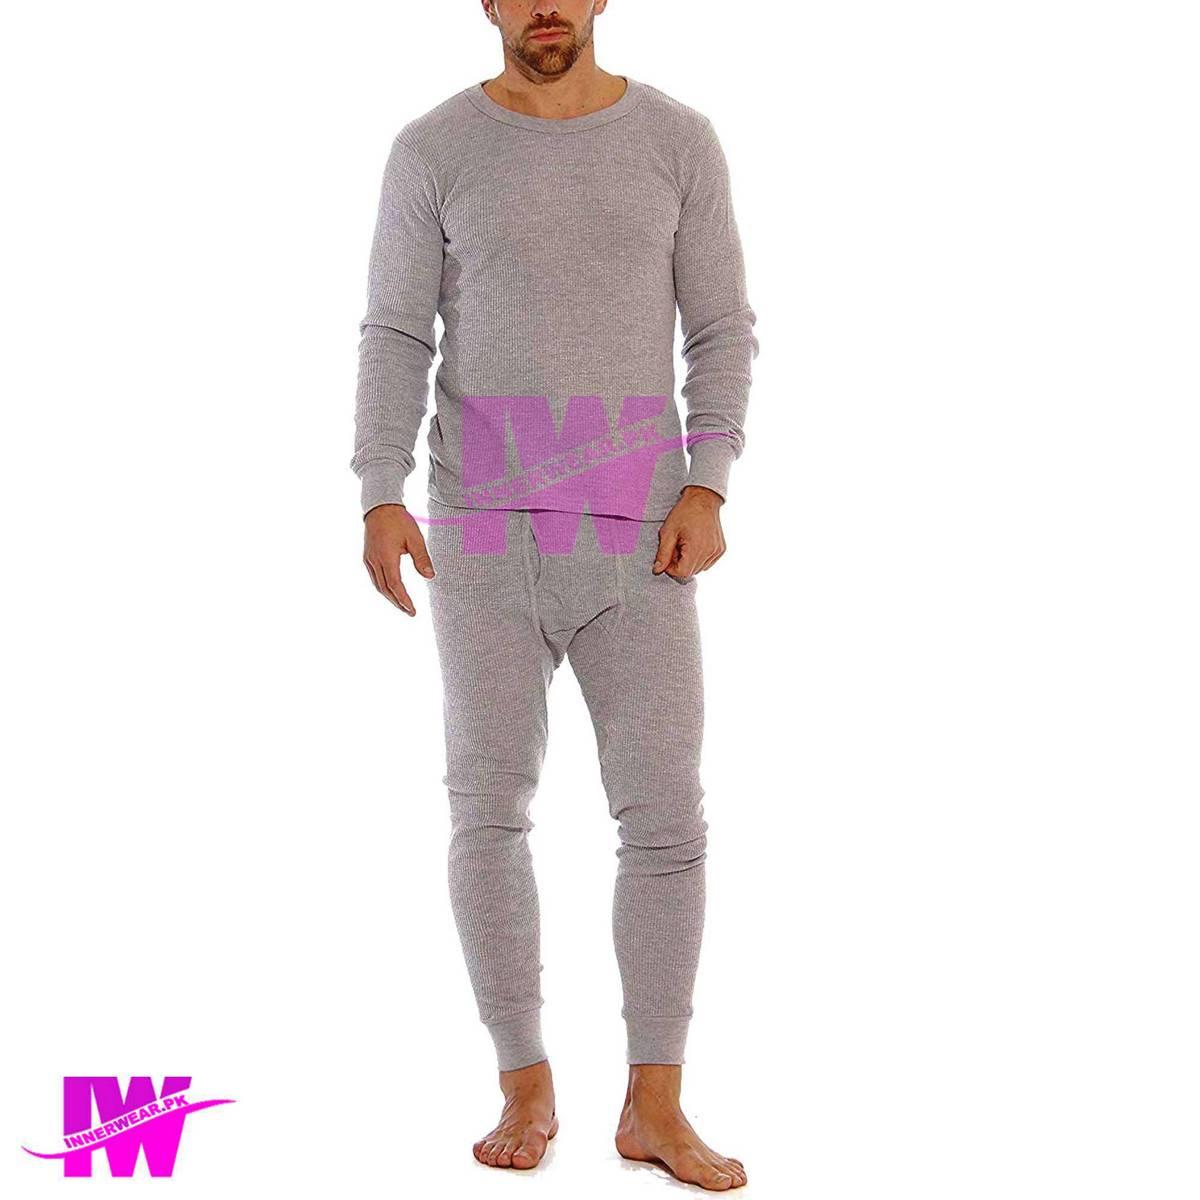 Men Premium Full Body Suit Thermal Body Warmer Skin Tight Stretchable Innerwear Winter Warm Long Johns Trouser Pajama Full Sleeve Shirt Grey